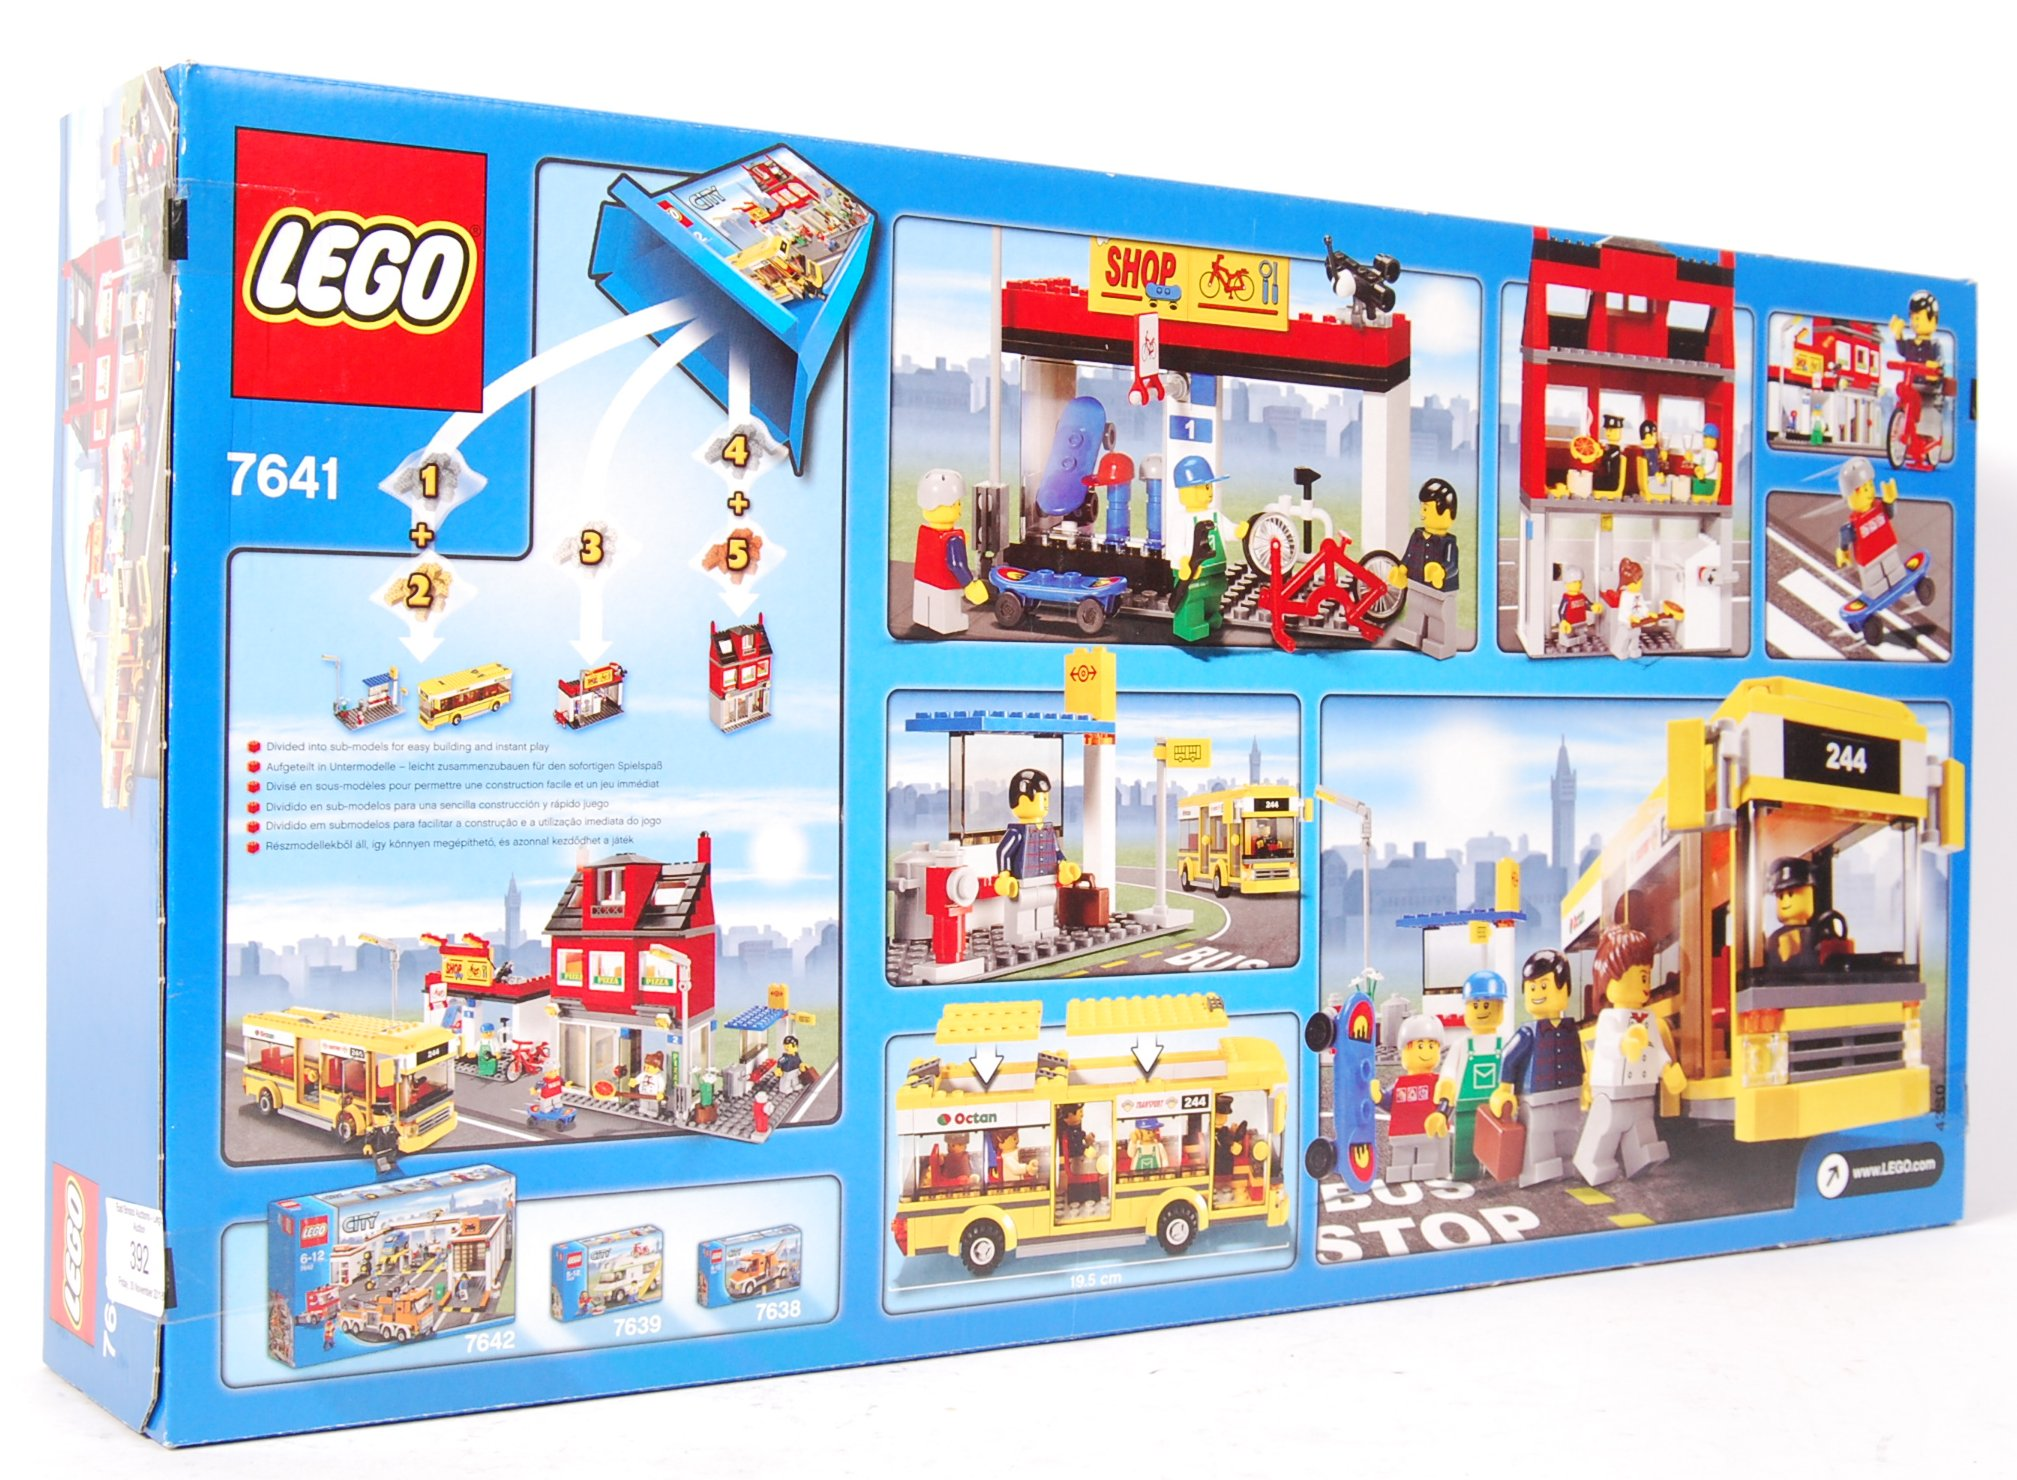 LEGO CITY SET NO. 7641 CITY CORNER - Image 2 of 2